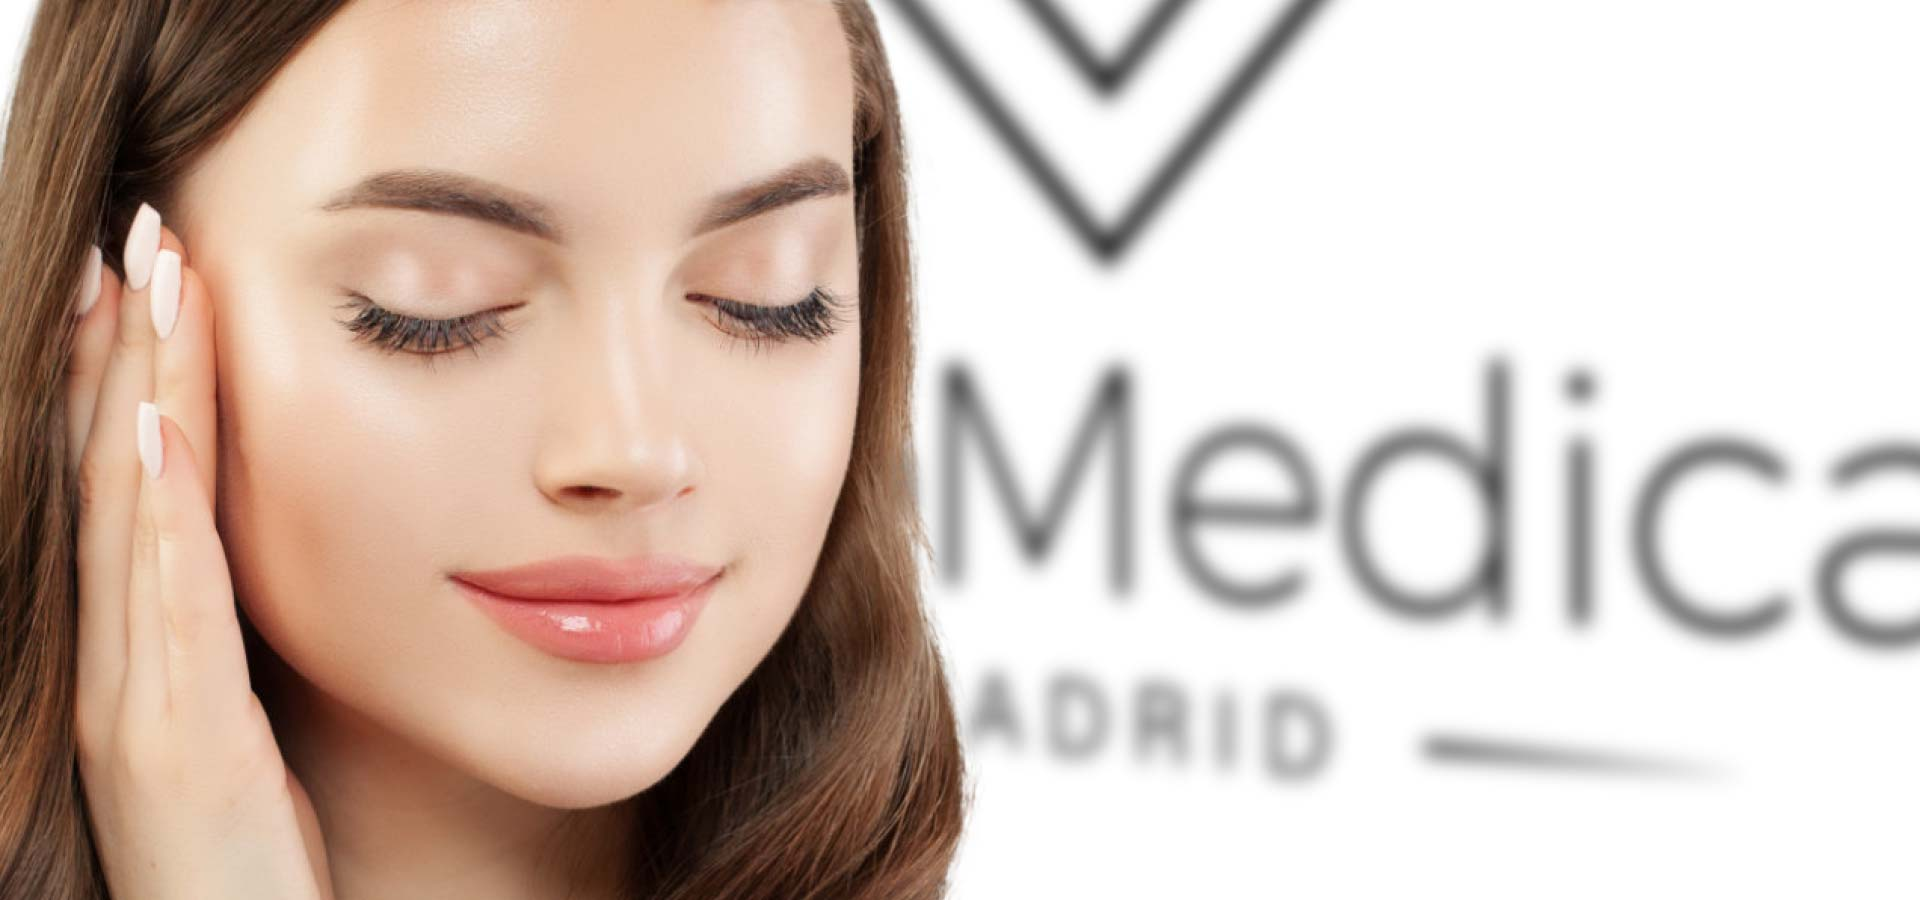 Medicina estética Rinomodelación